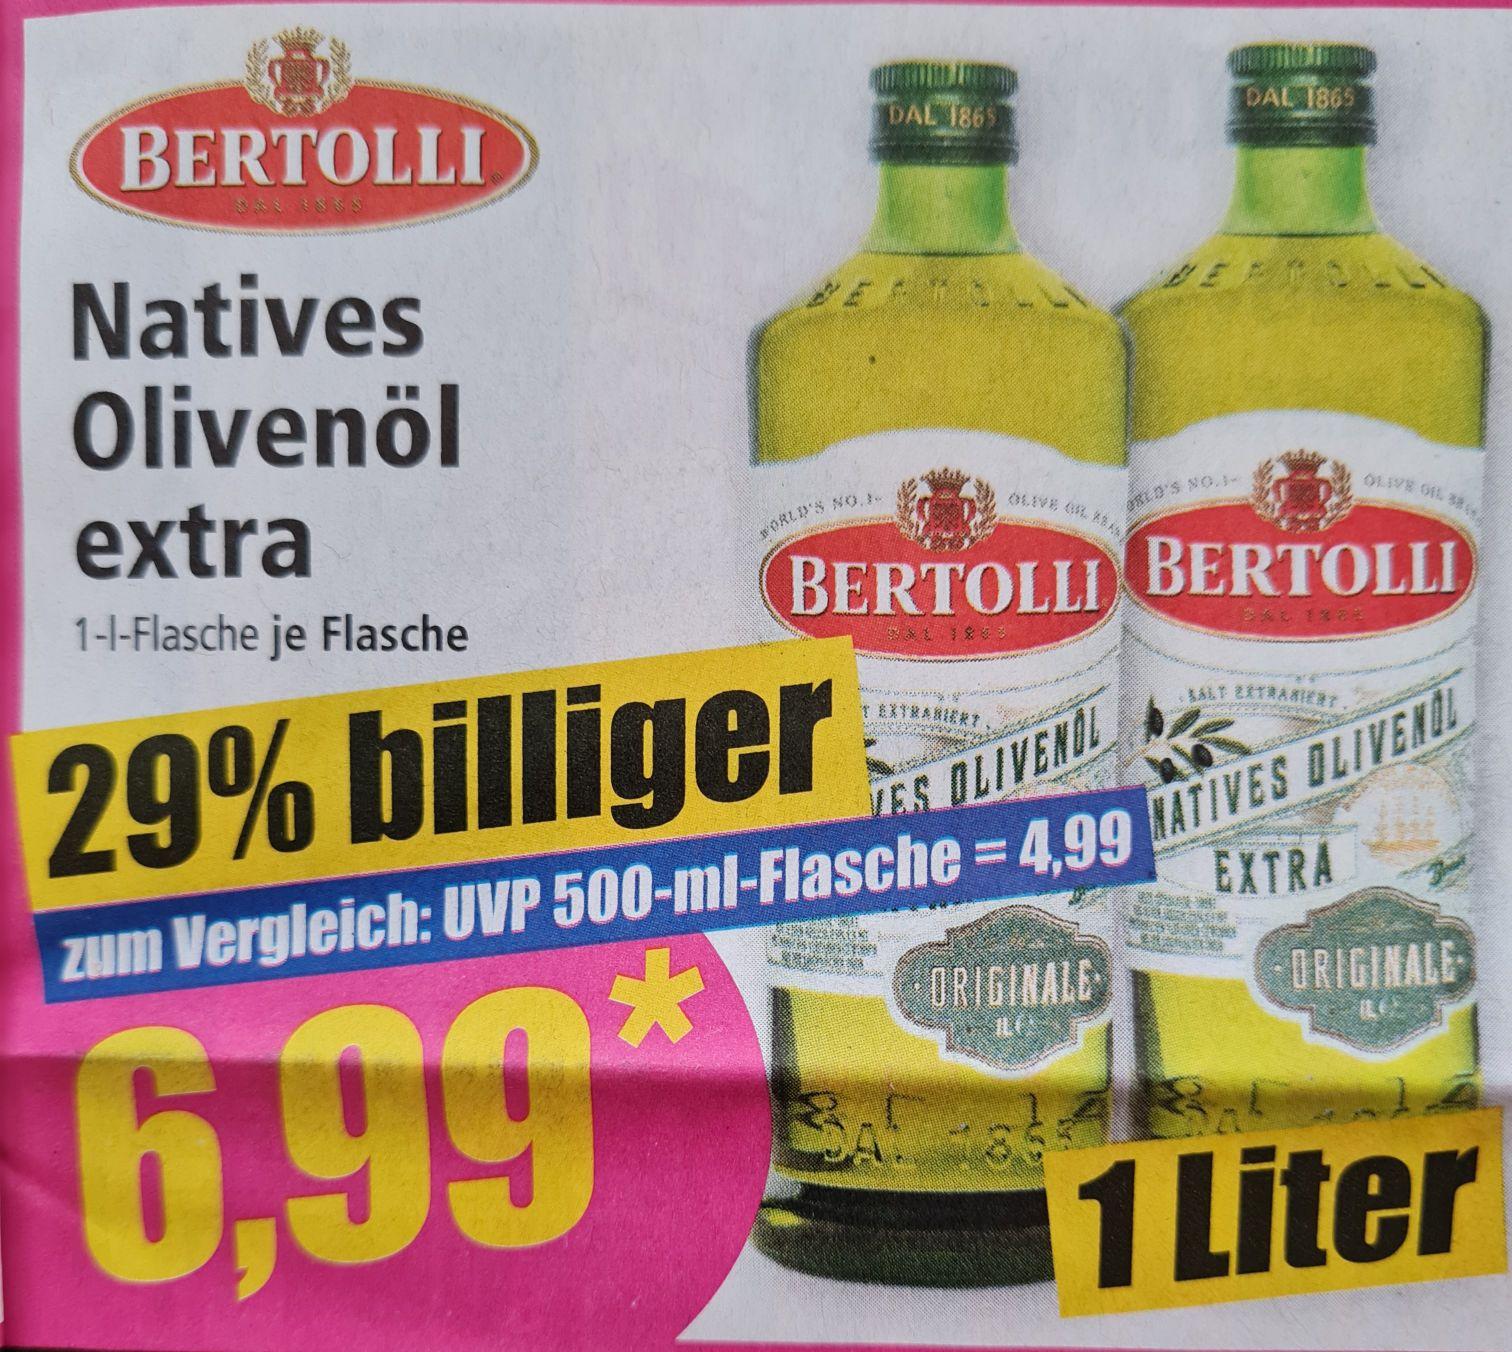 Natives Olivenöl extra 1 Liter Flasche ab 12.04 Norma